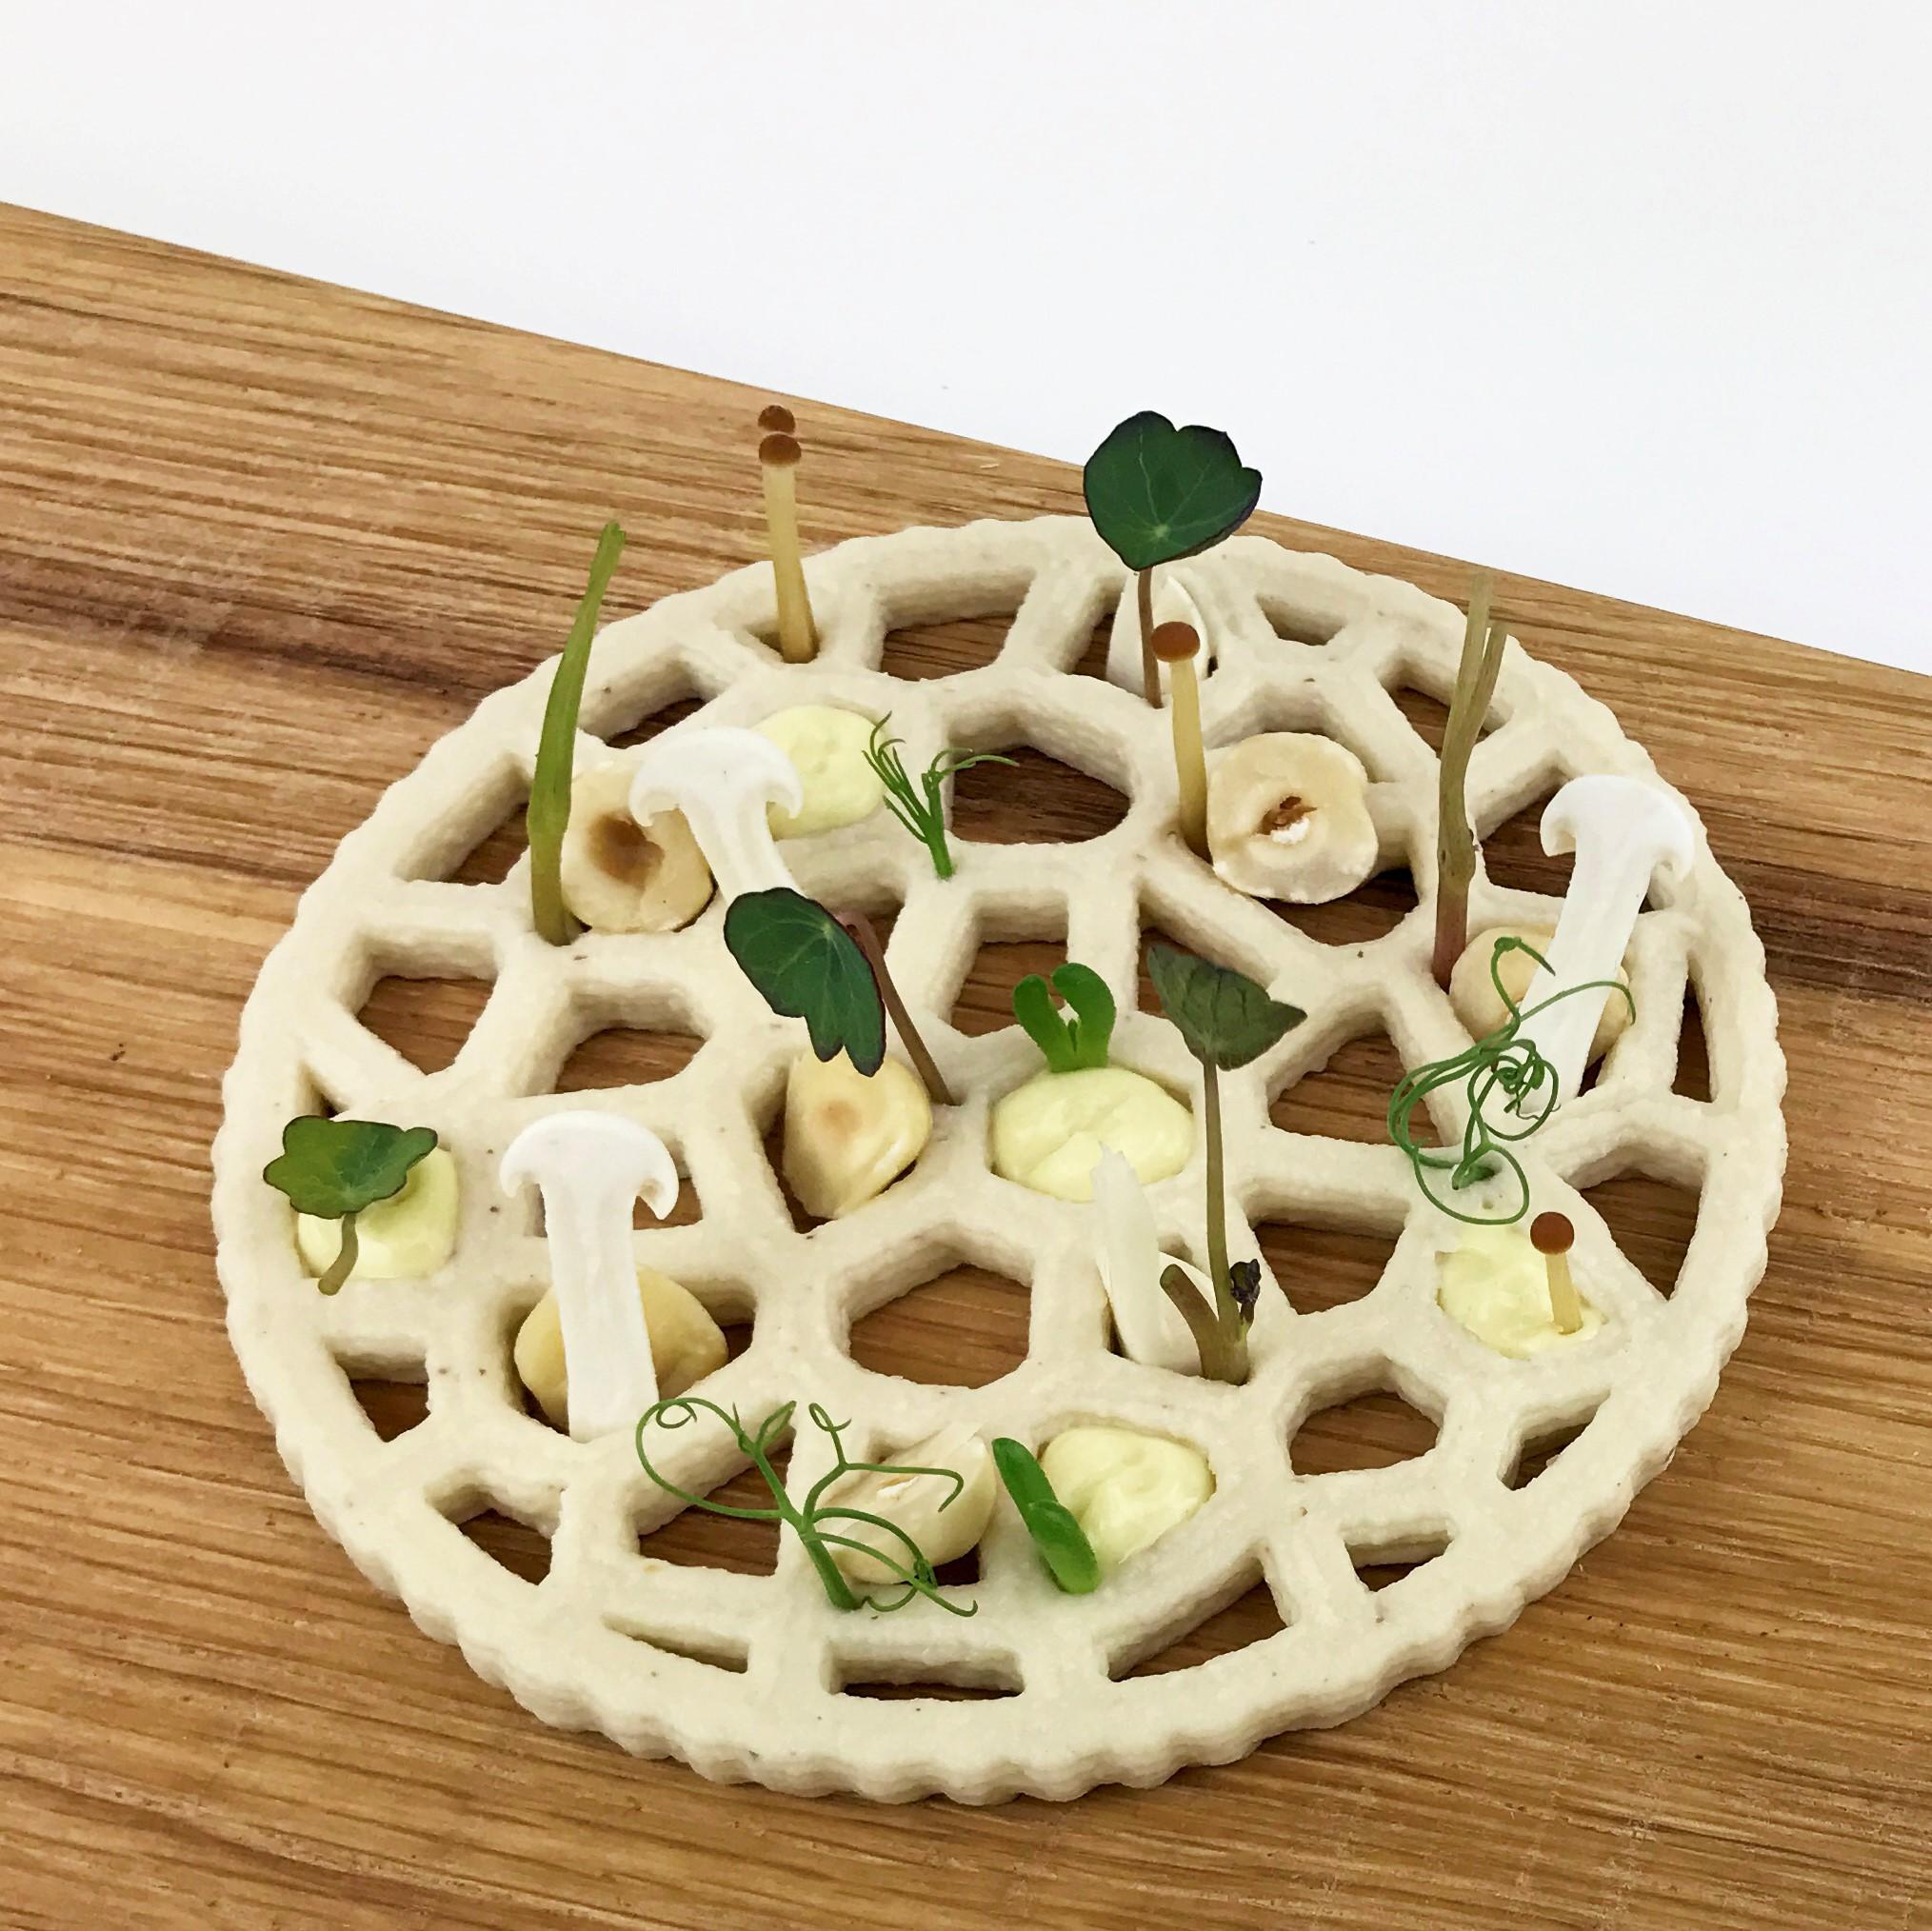 3D printed hummus